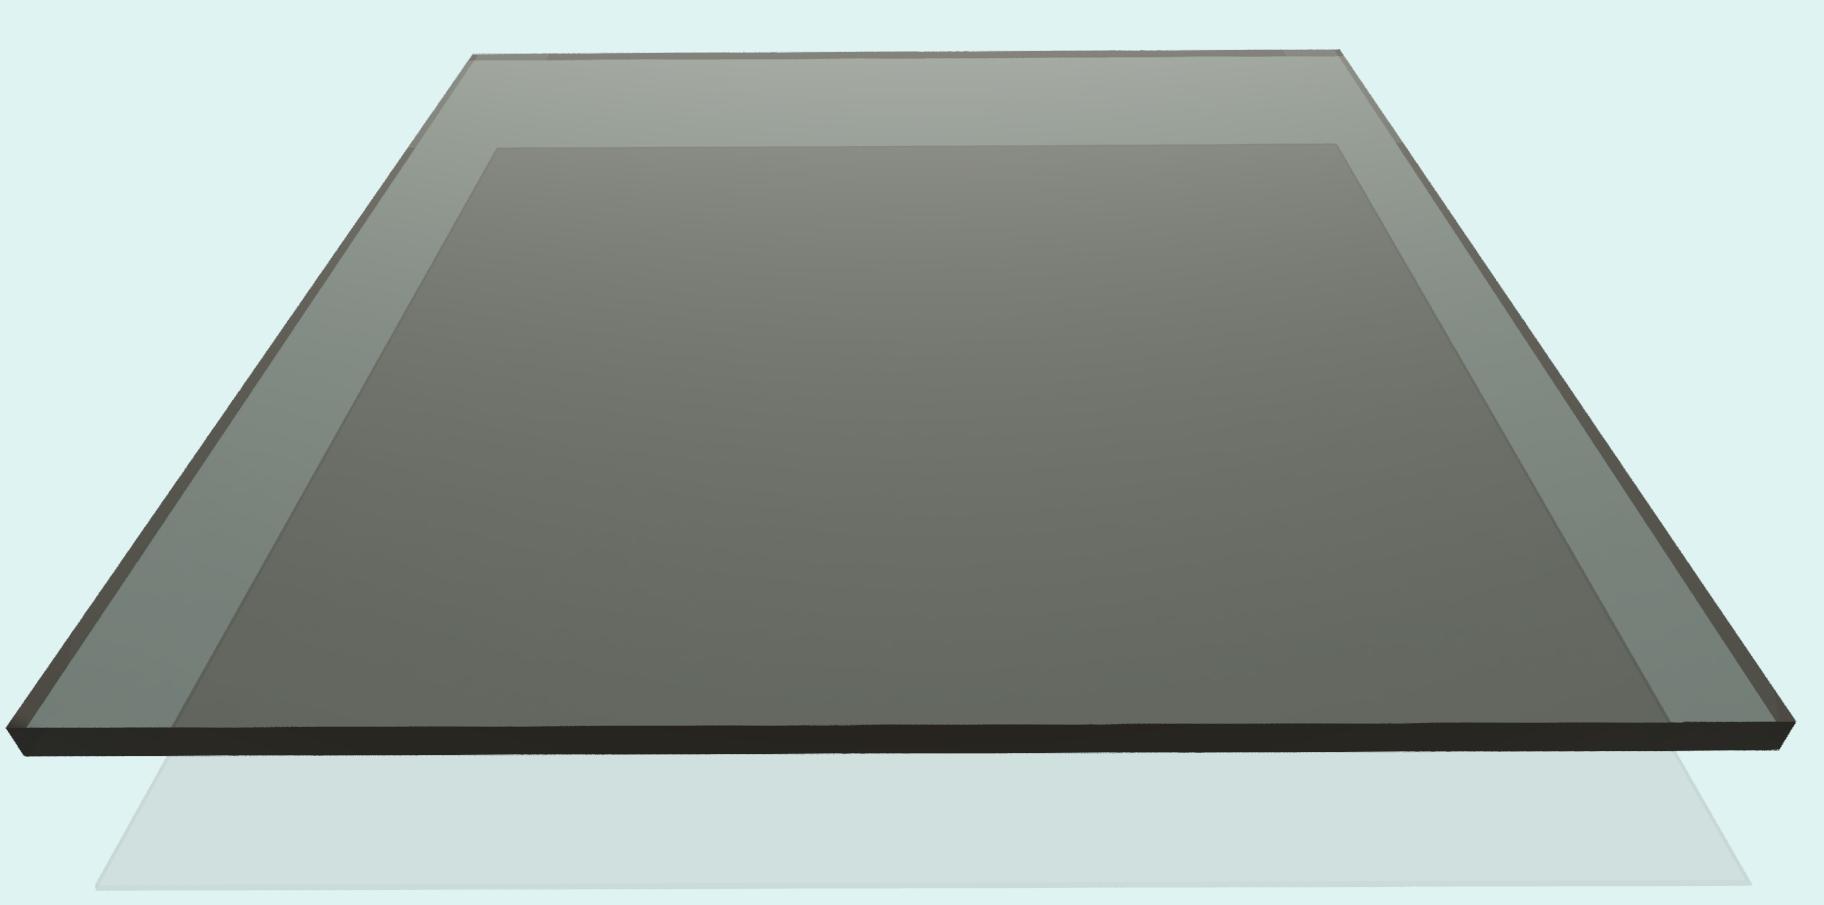 Polycarbonat 5 mm, rauchfarben